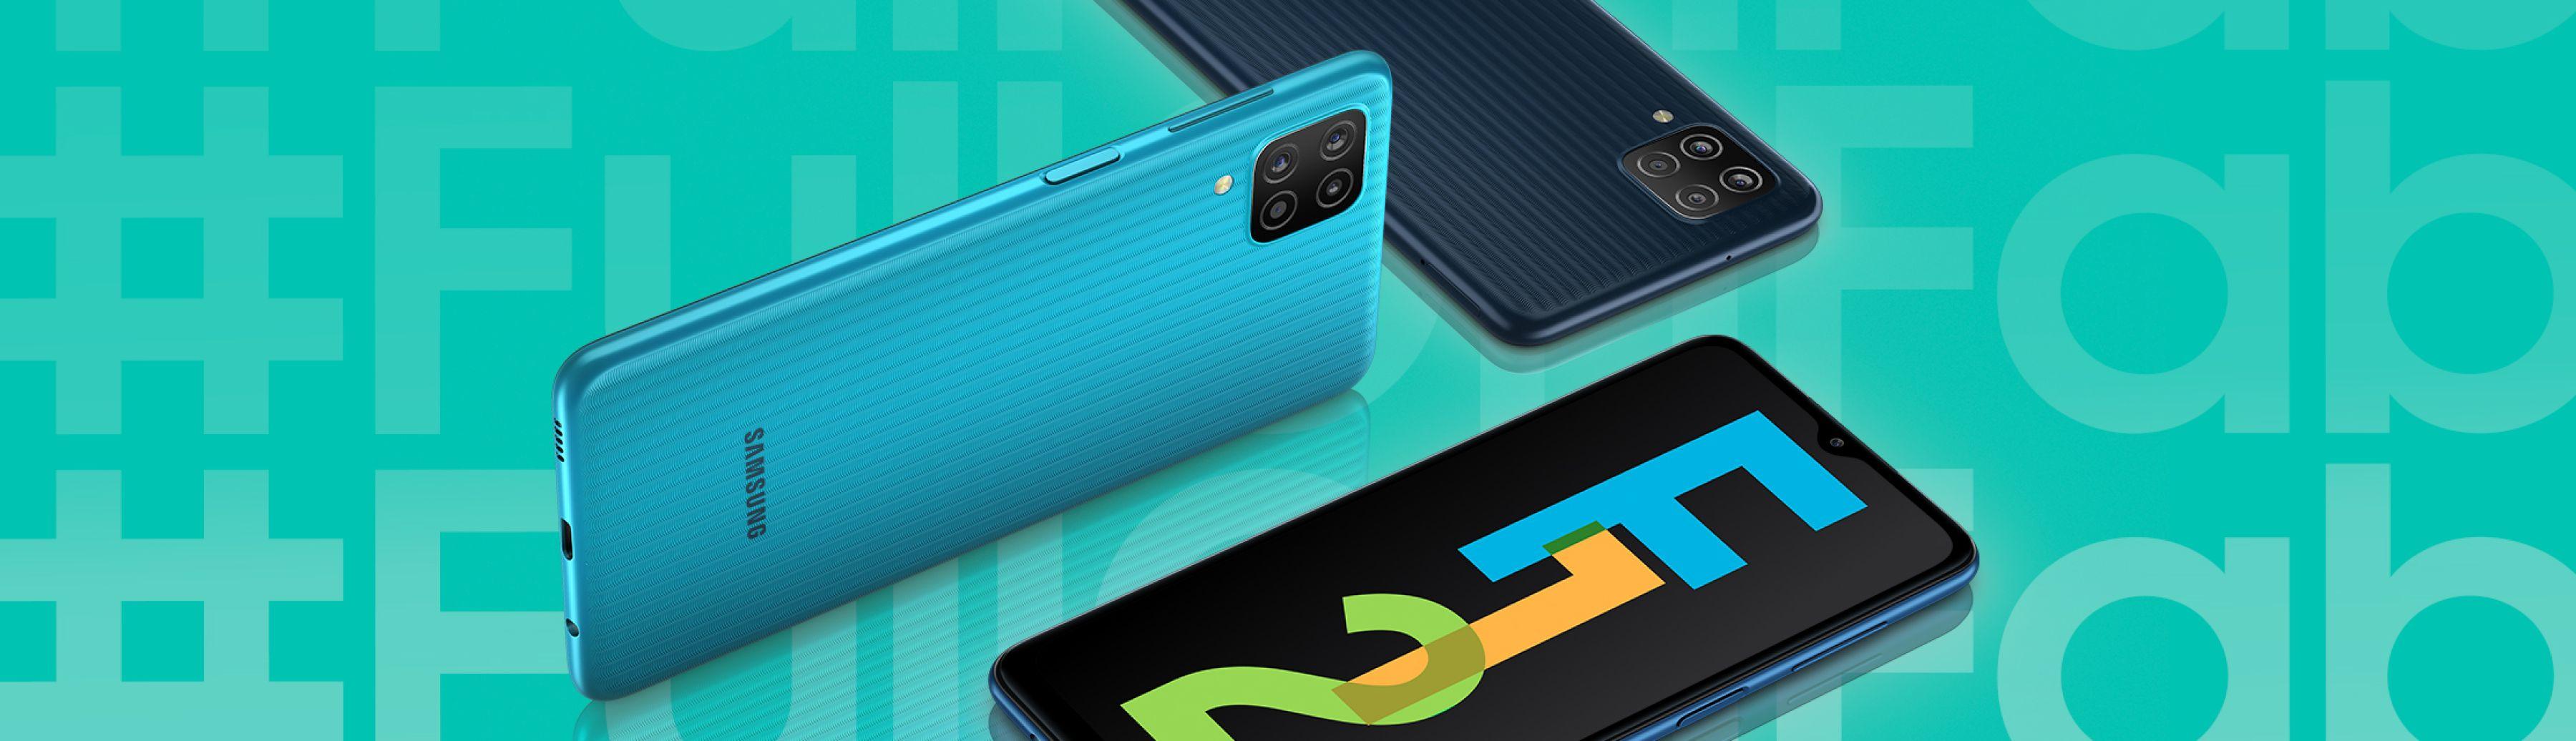 smartfon Samsung Galaxy F12 smartphone